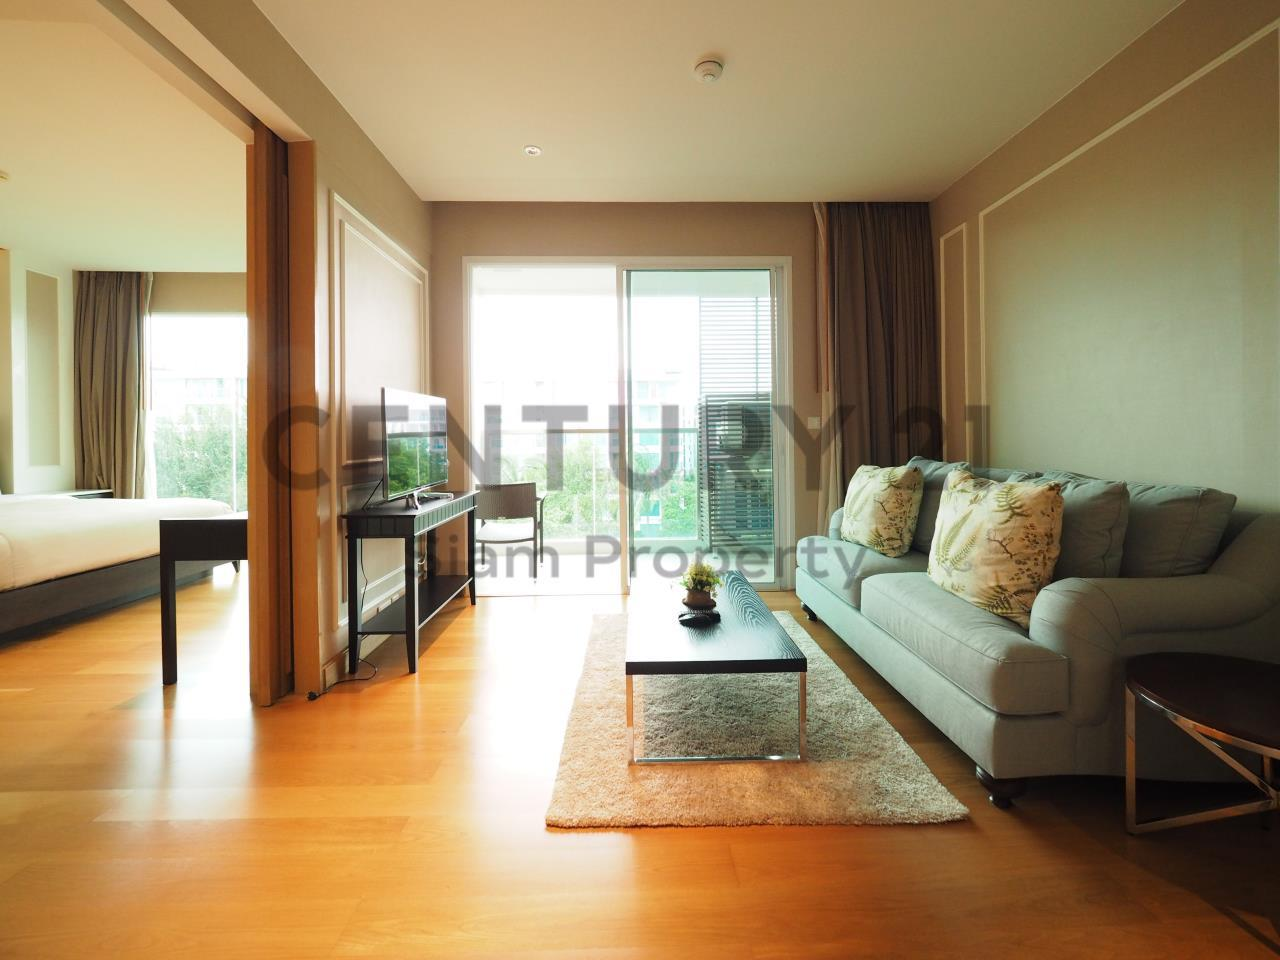 Century21 Siam Property Agency's Amari Huahin 1